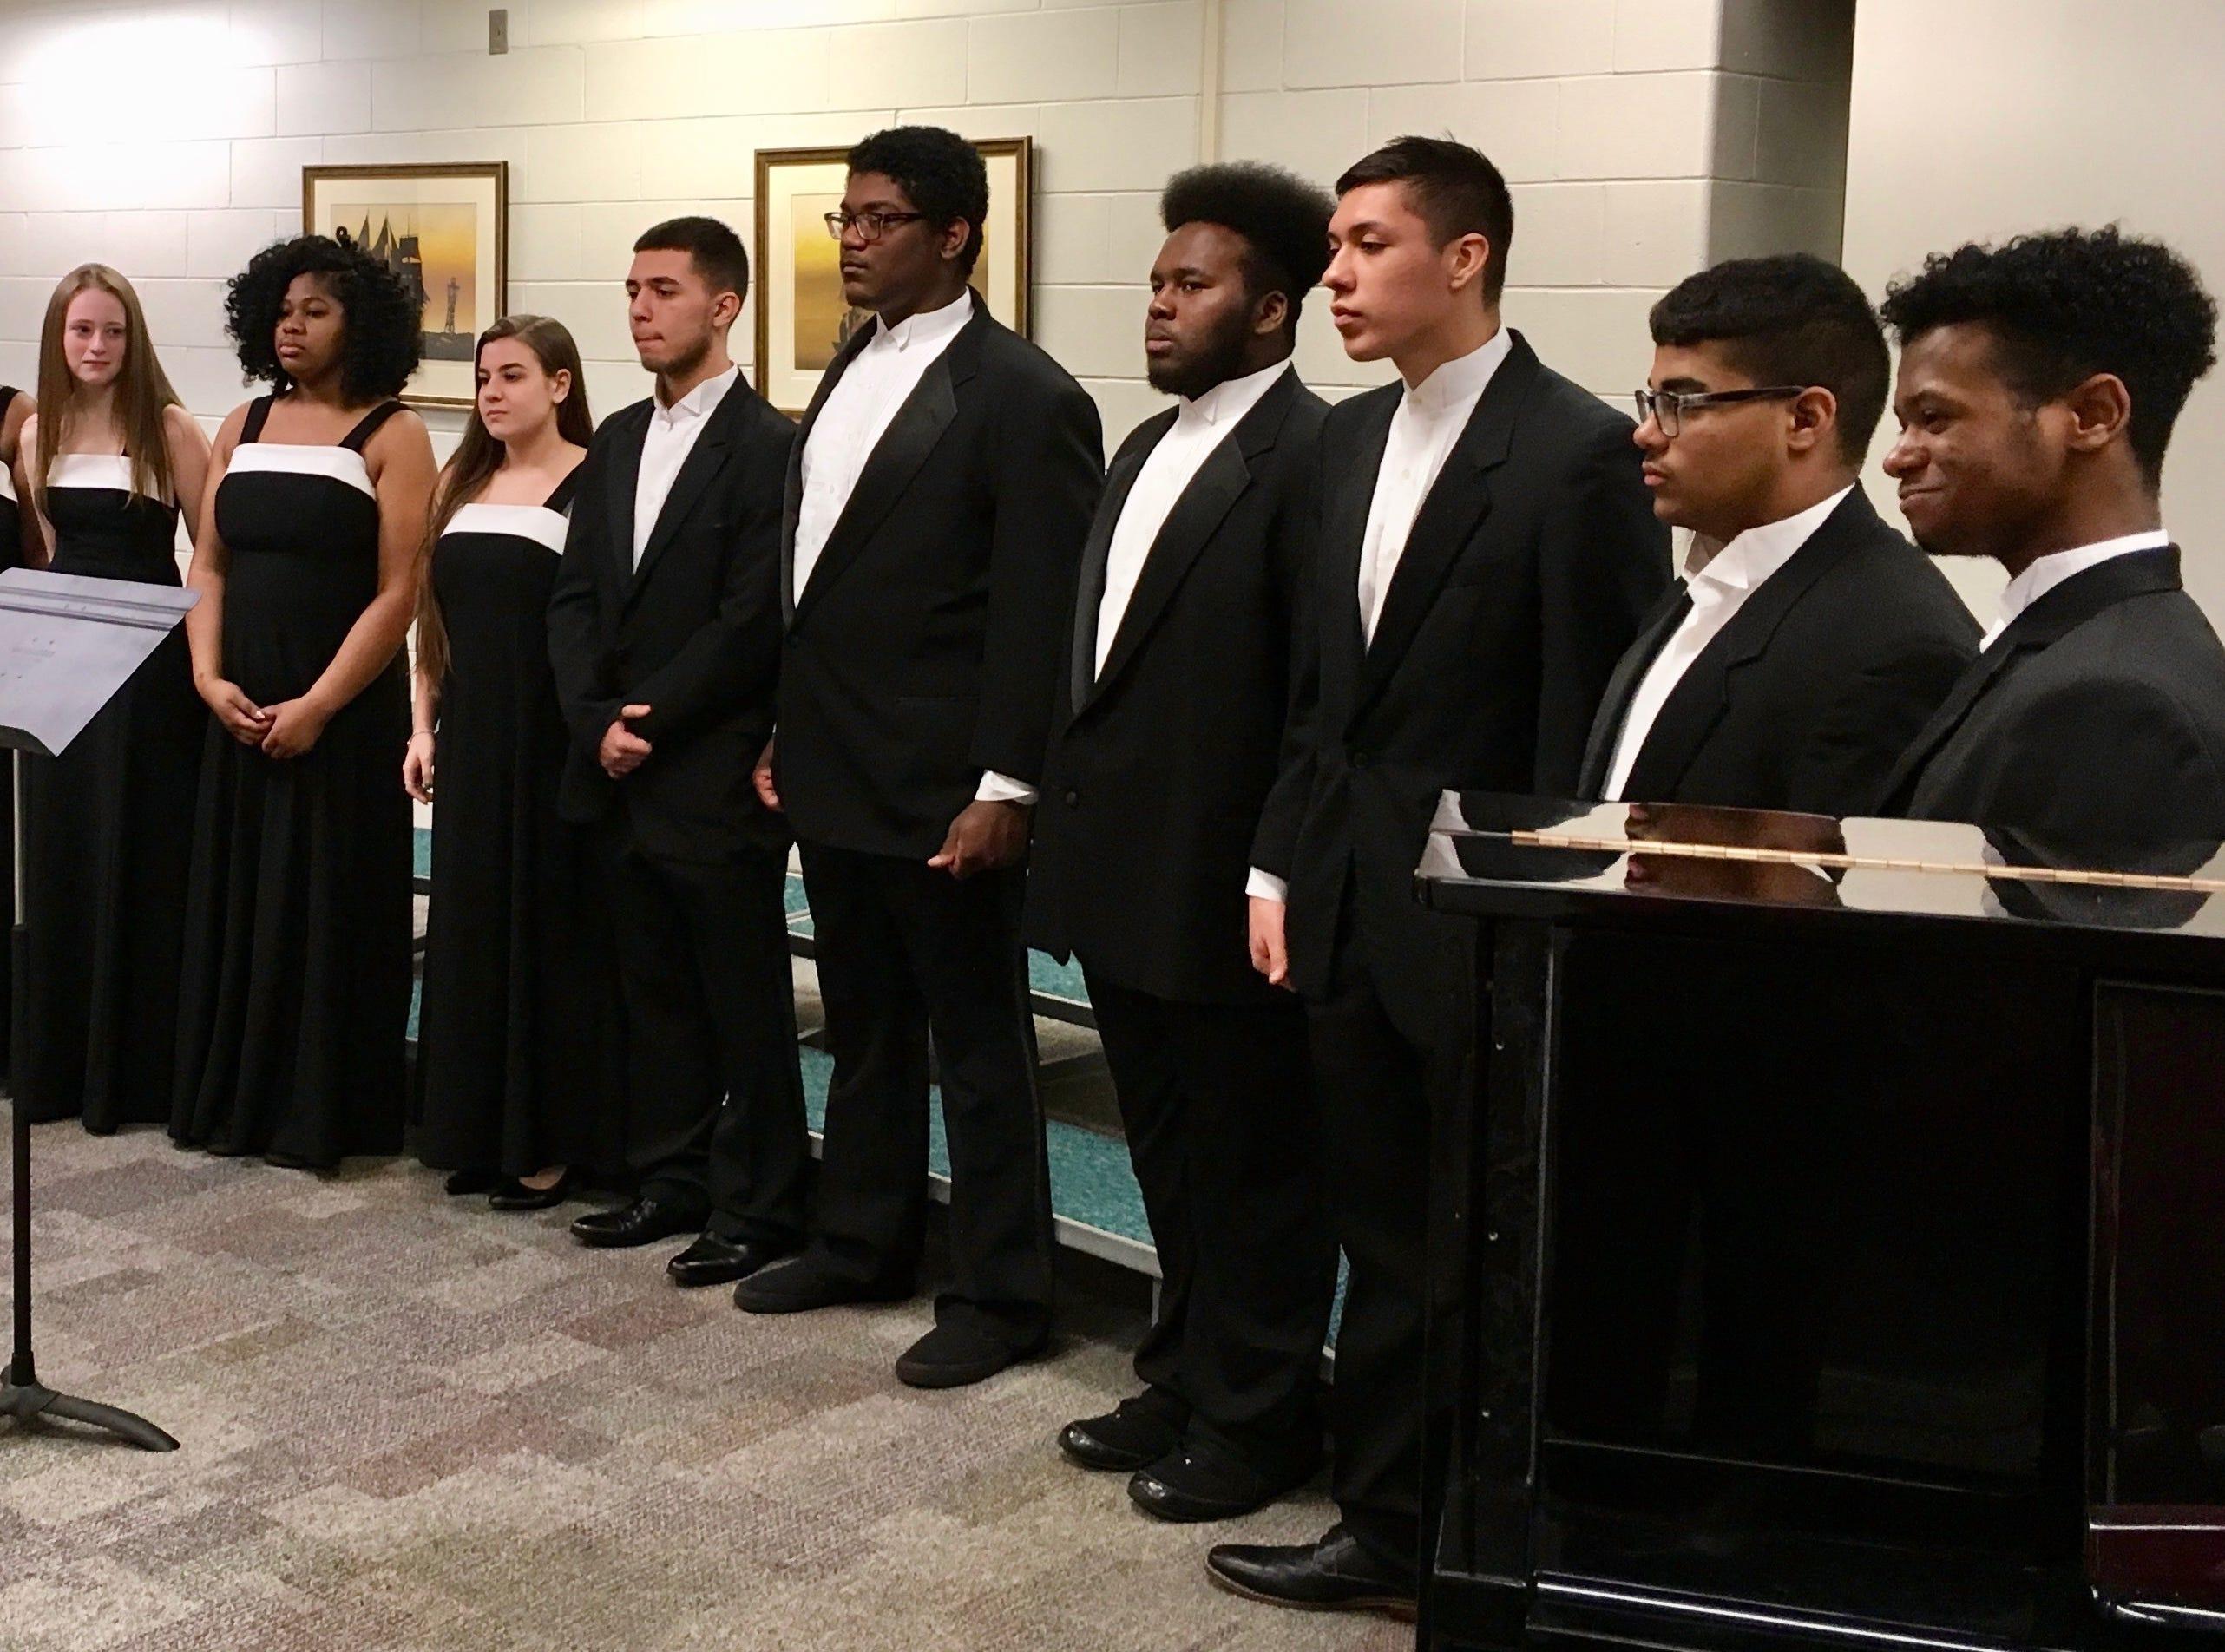 The Linden High School madrigals